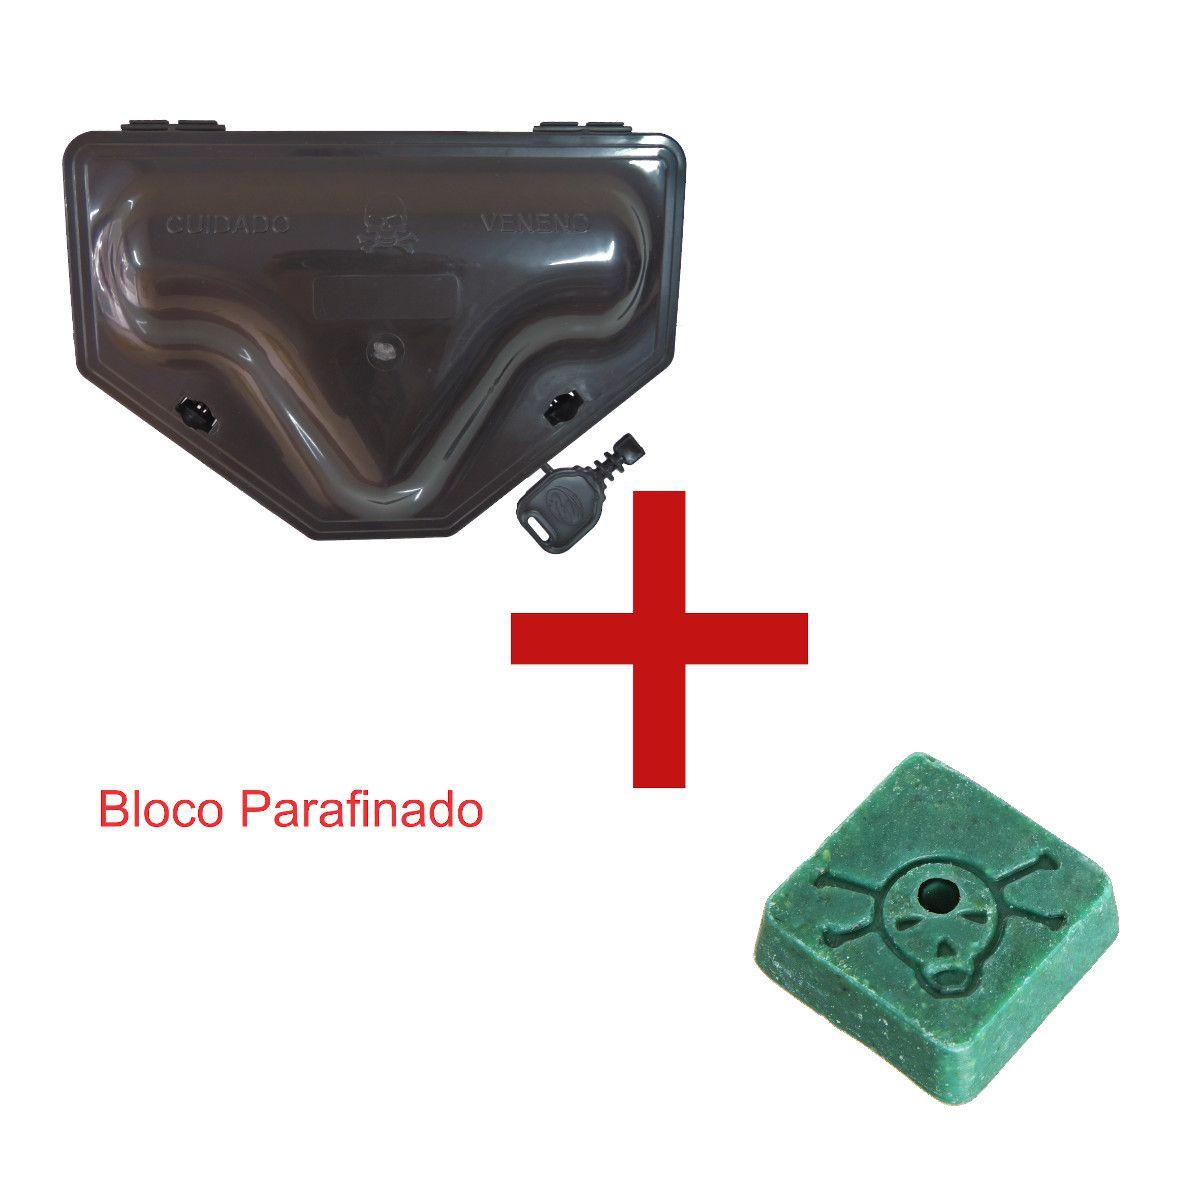 KIT 70 Porta Iscas Resistentes 2 TRAVAS c/ Chave Mata Ratos